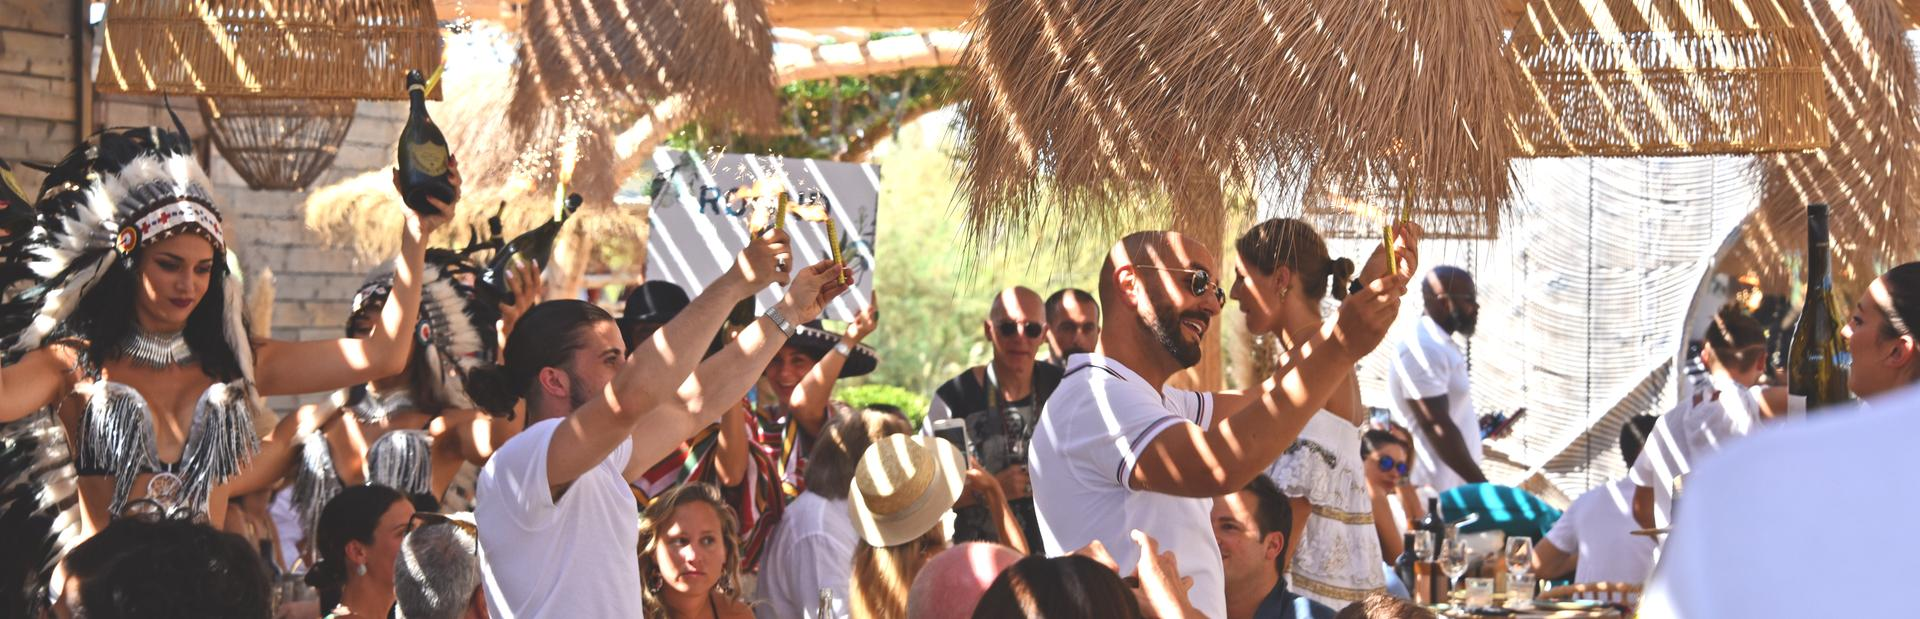 The best St Tropez beach clubs 2021